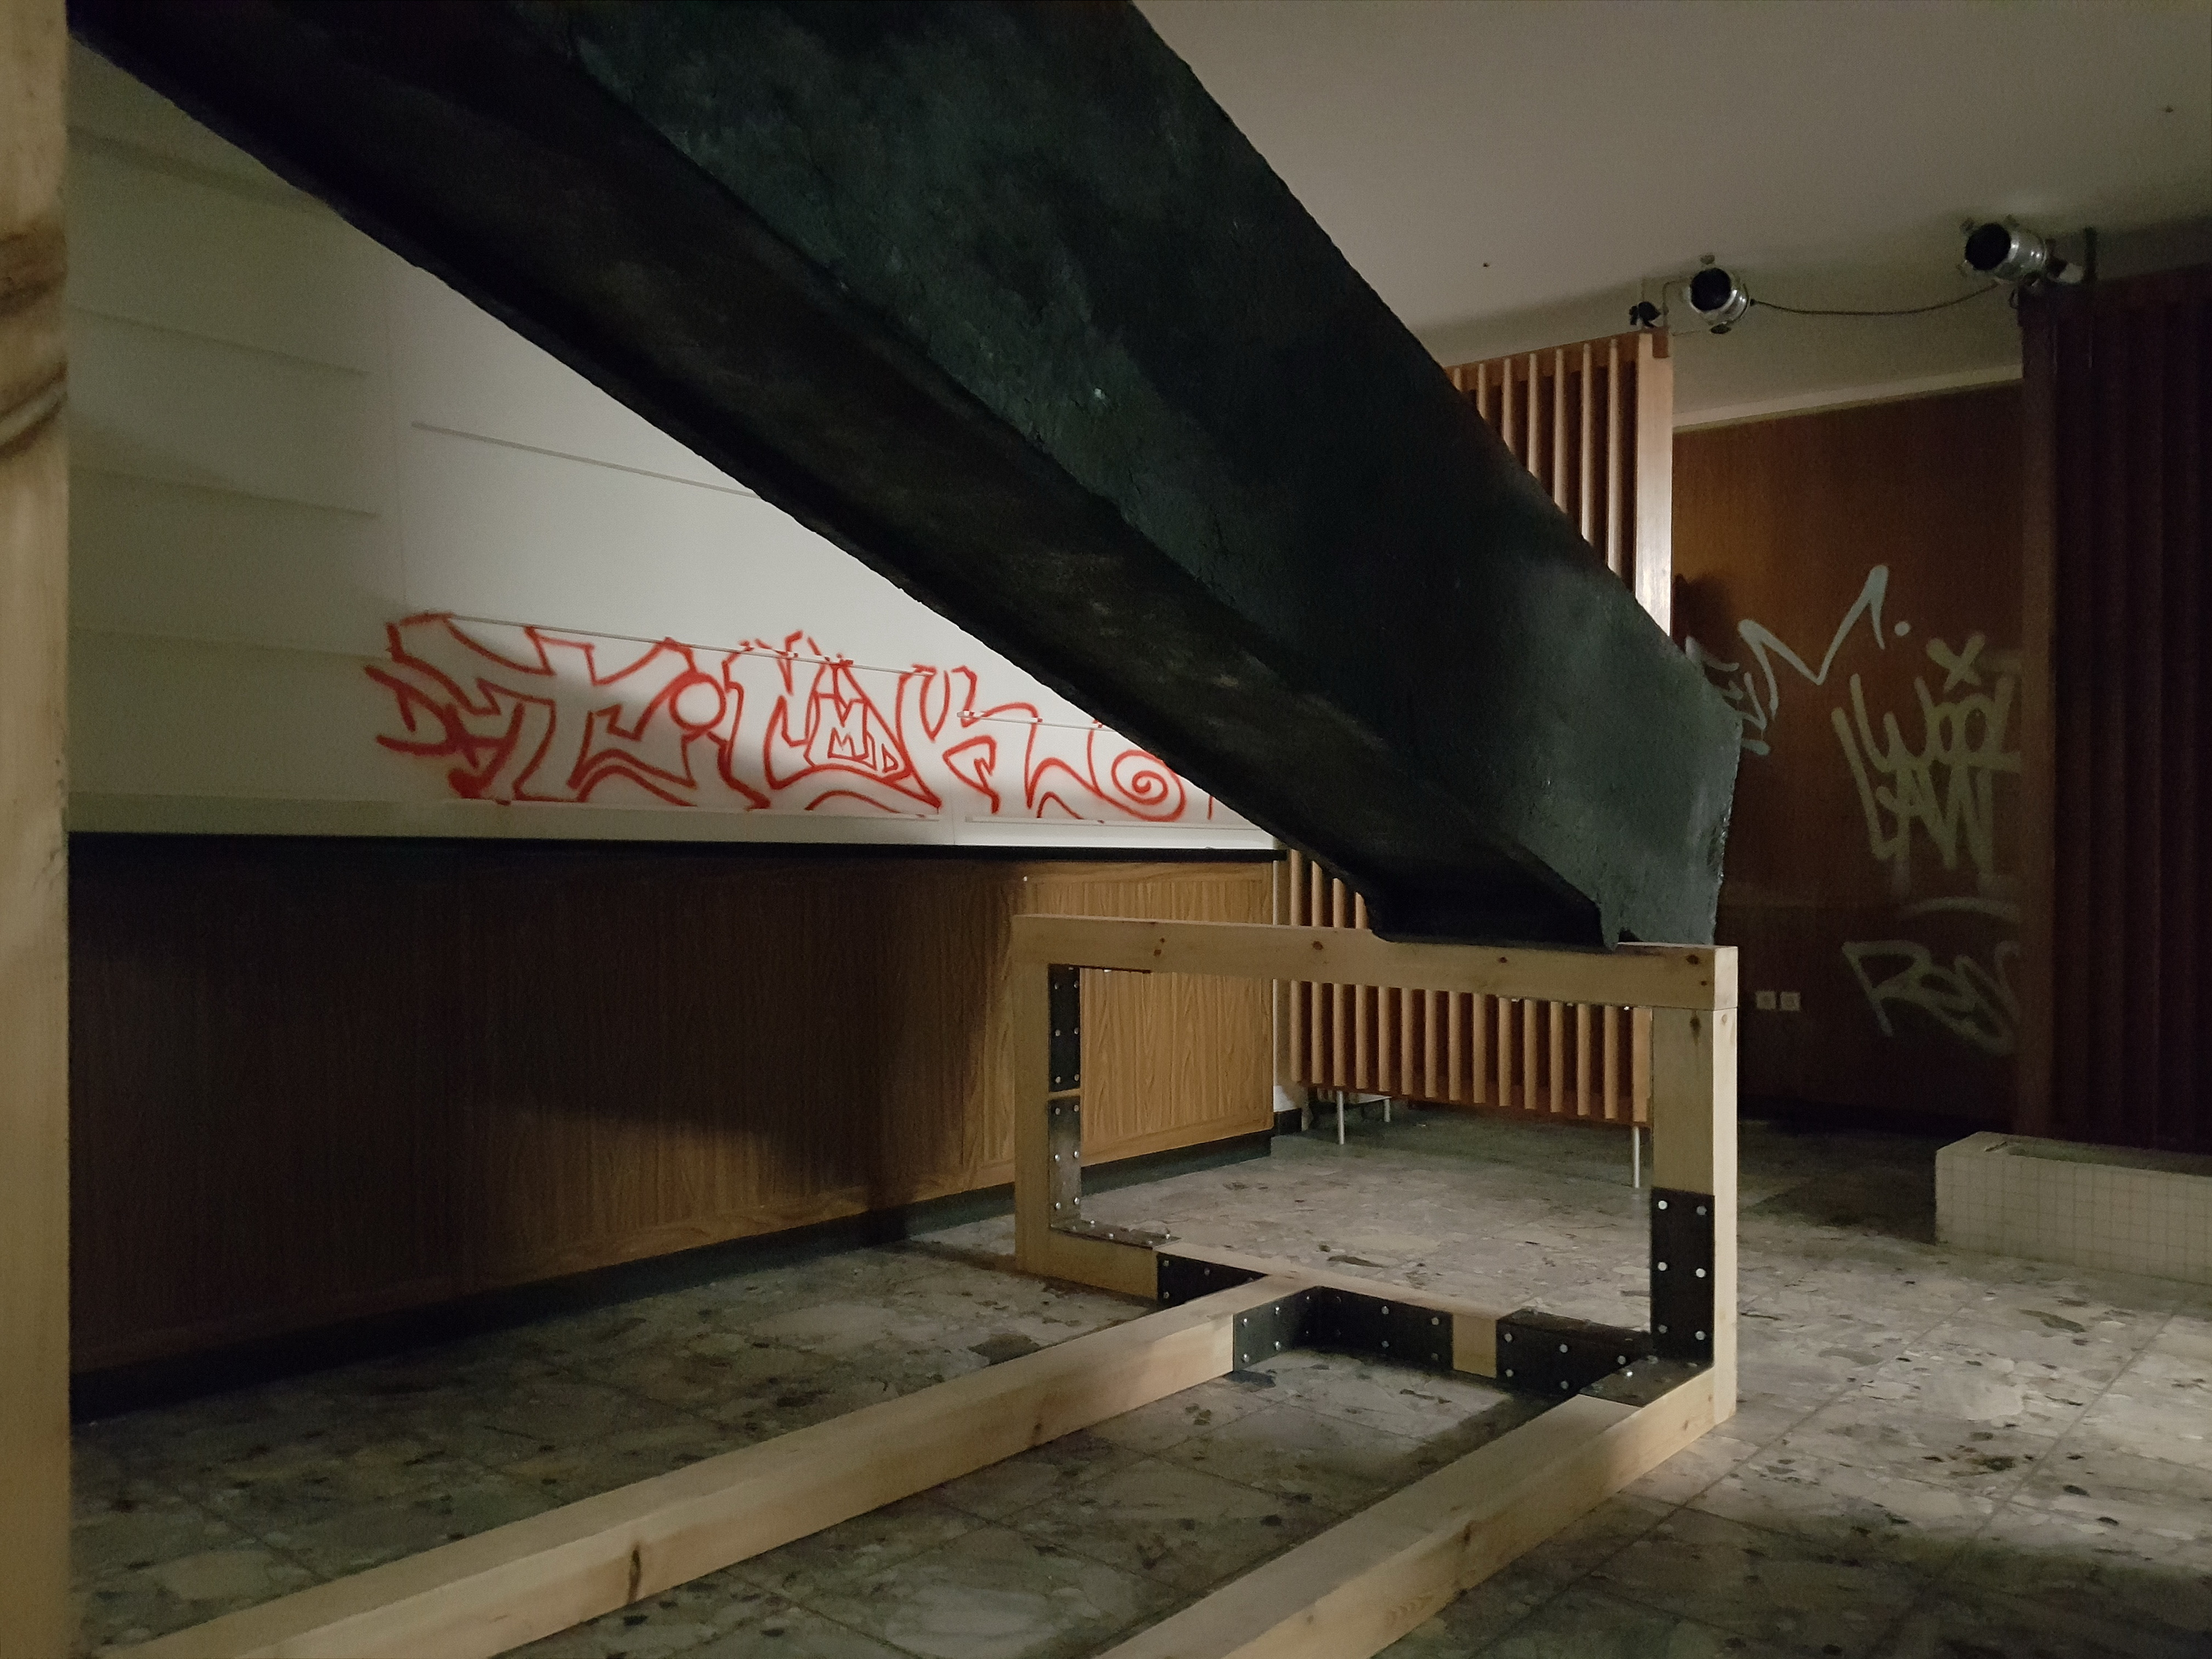 Installation Views - Passengers of a Kaleidoscopic Journey, 2018 - Group Exhibition - Berlin - Artwork: Untitled 2018 - Sculpture by Erik Andersen